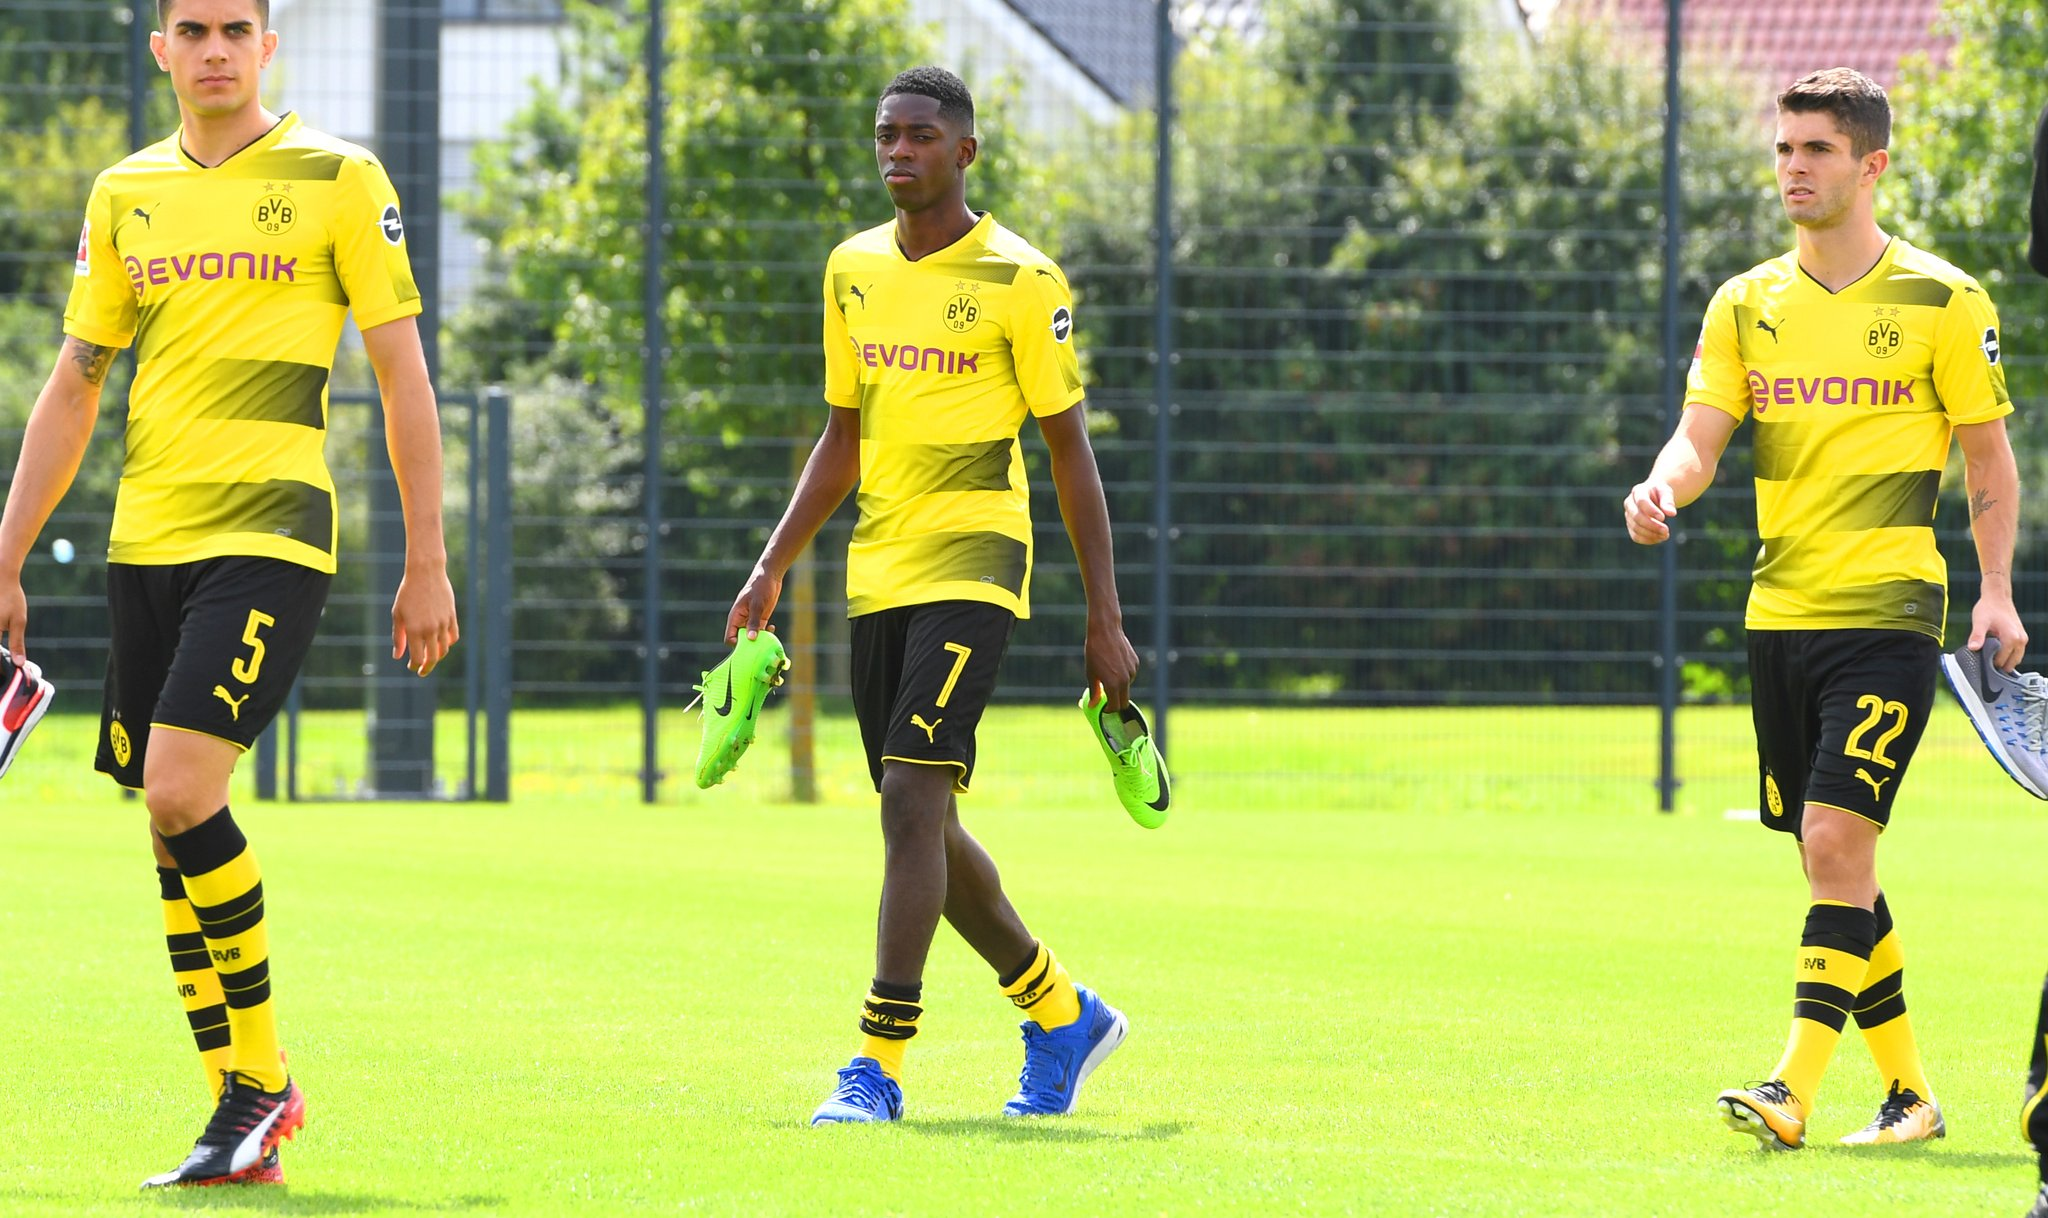 Breaking: Dortmund Suspend Want-Away Ousmane Dembele